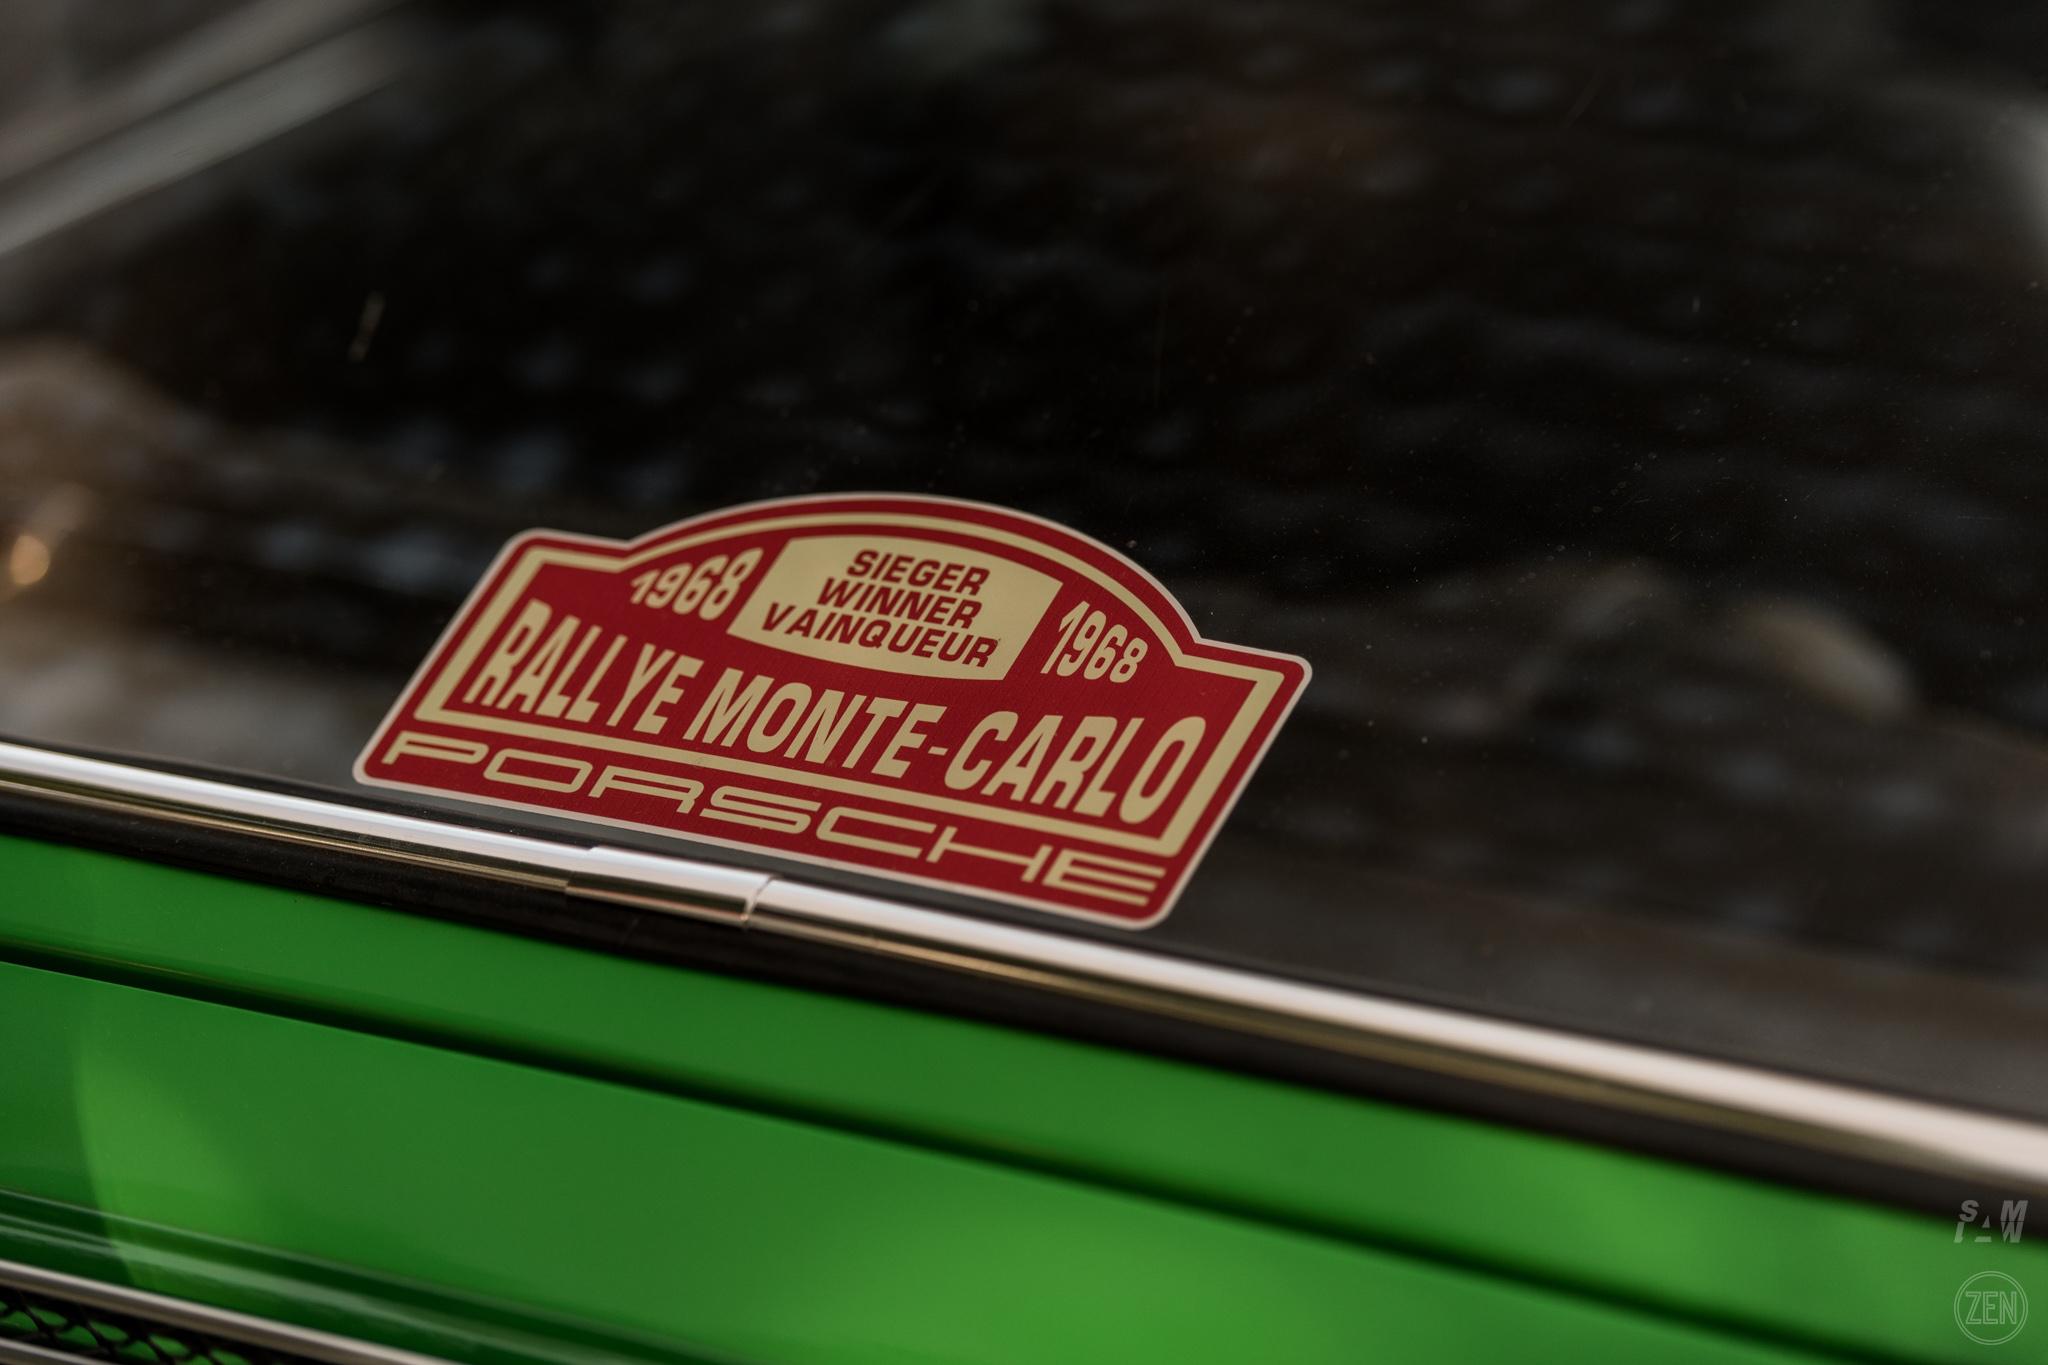 2019-10-27 - Autohaus Porsches & Coffee 109